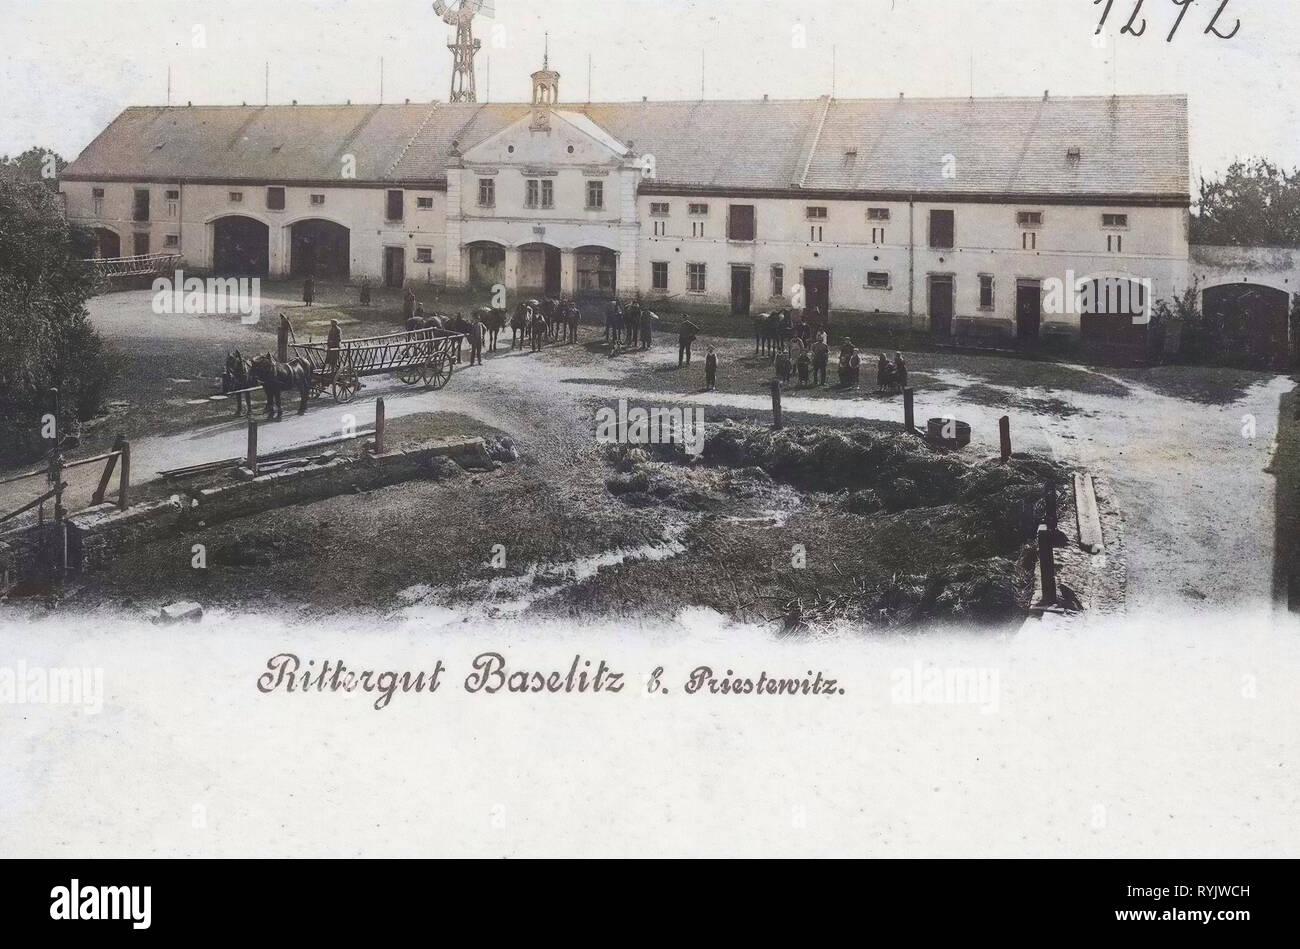 En Sajonia, Leiterwagen Rittergüter, turbinas eólicas en Sajonia, Baselitz (Priestewitz) 1899, Landkreis Meißen, Baselitz, Rittergut, Alemania Foto de stock